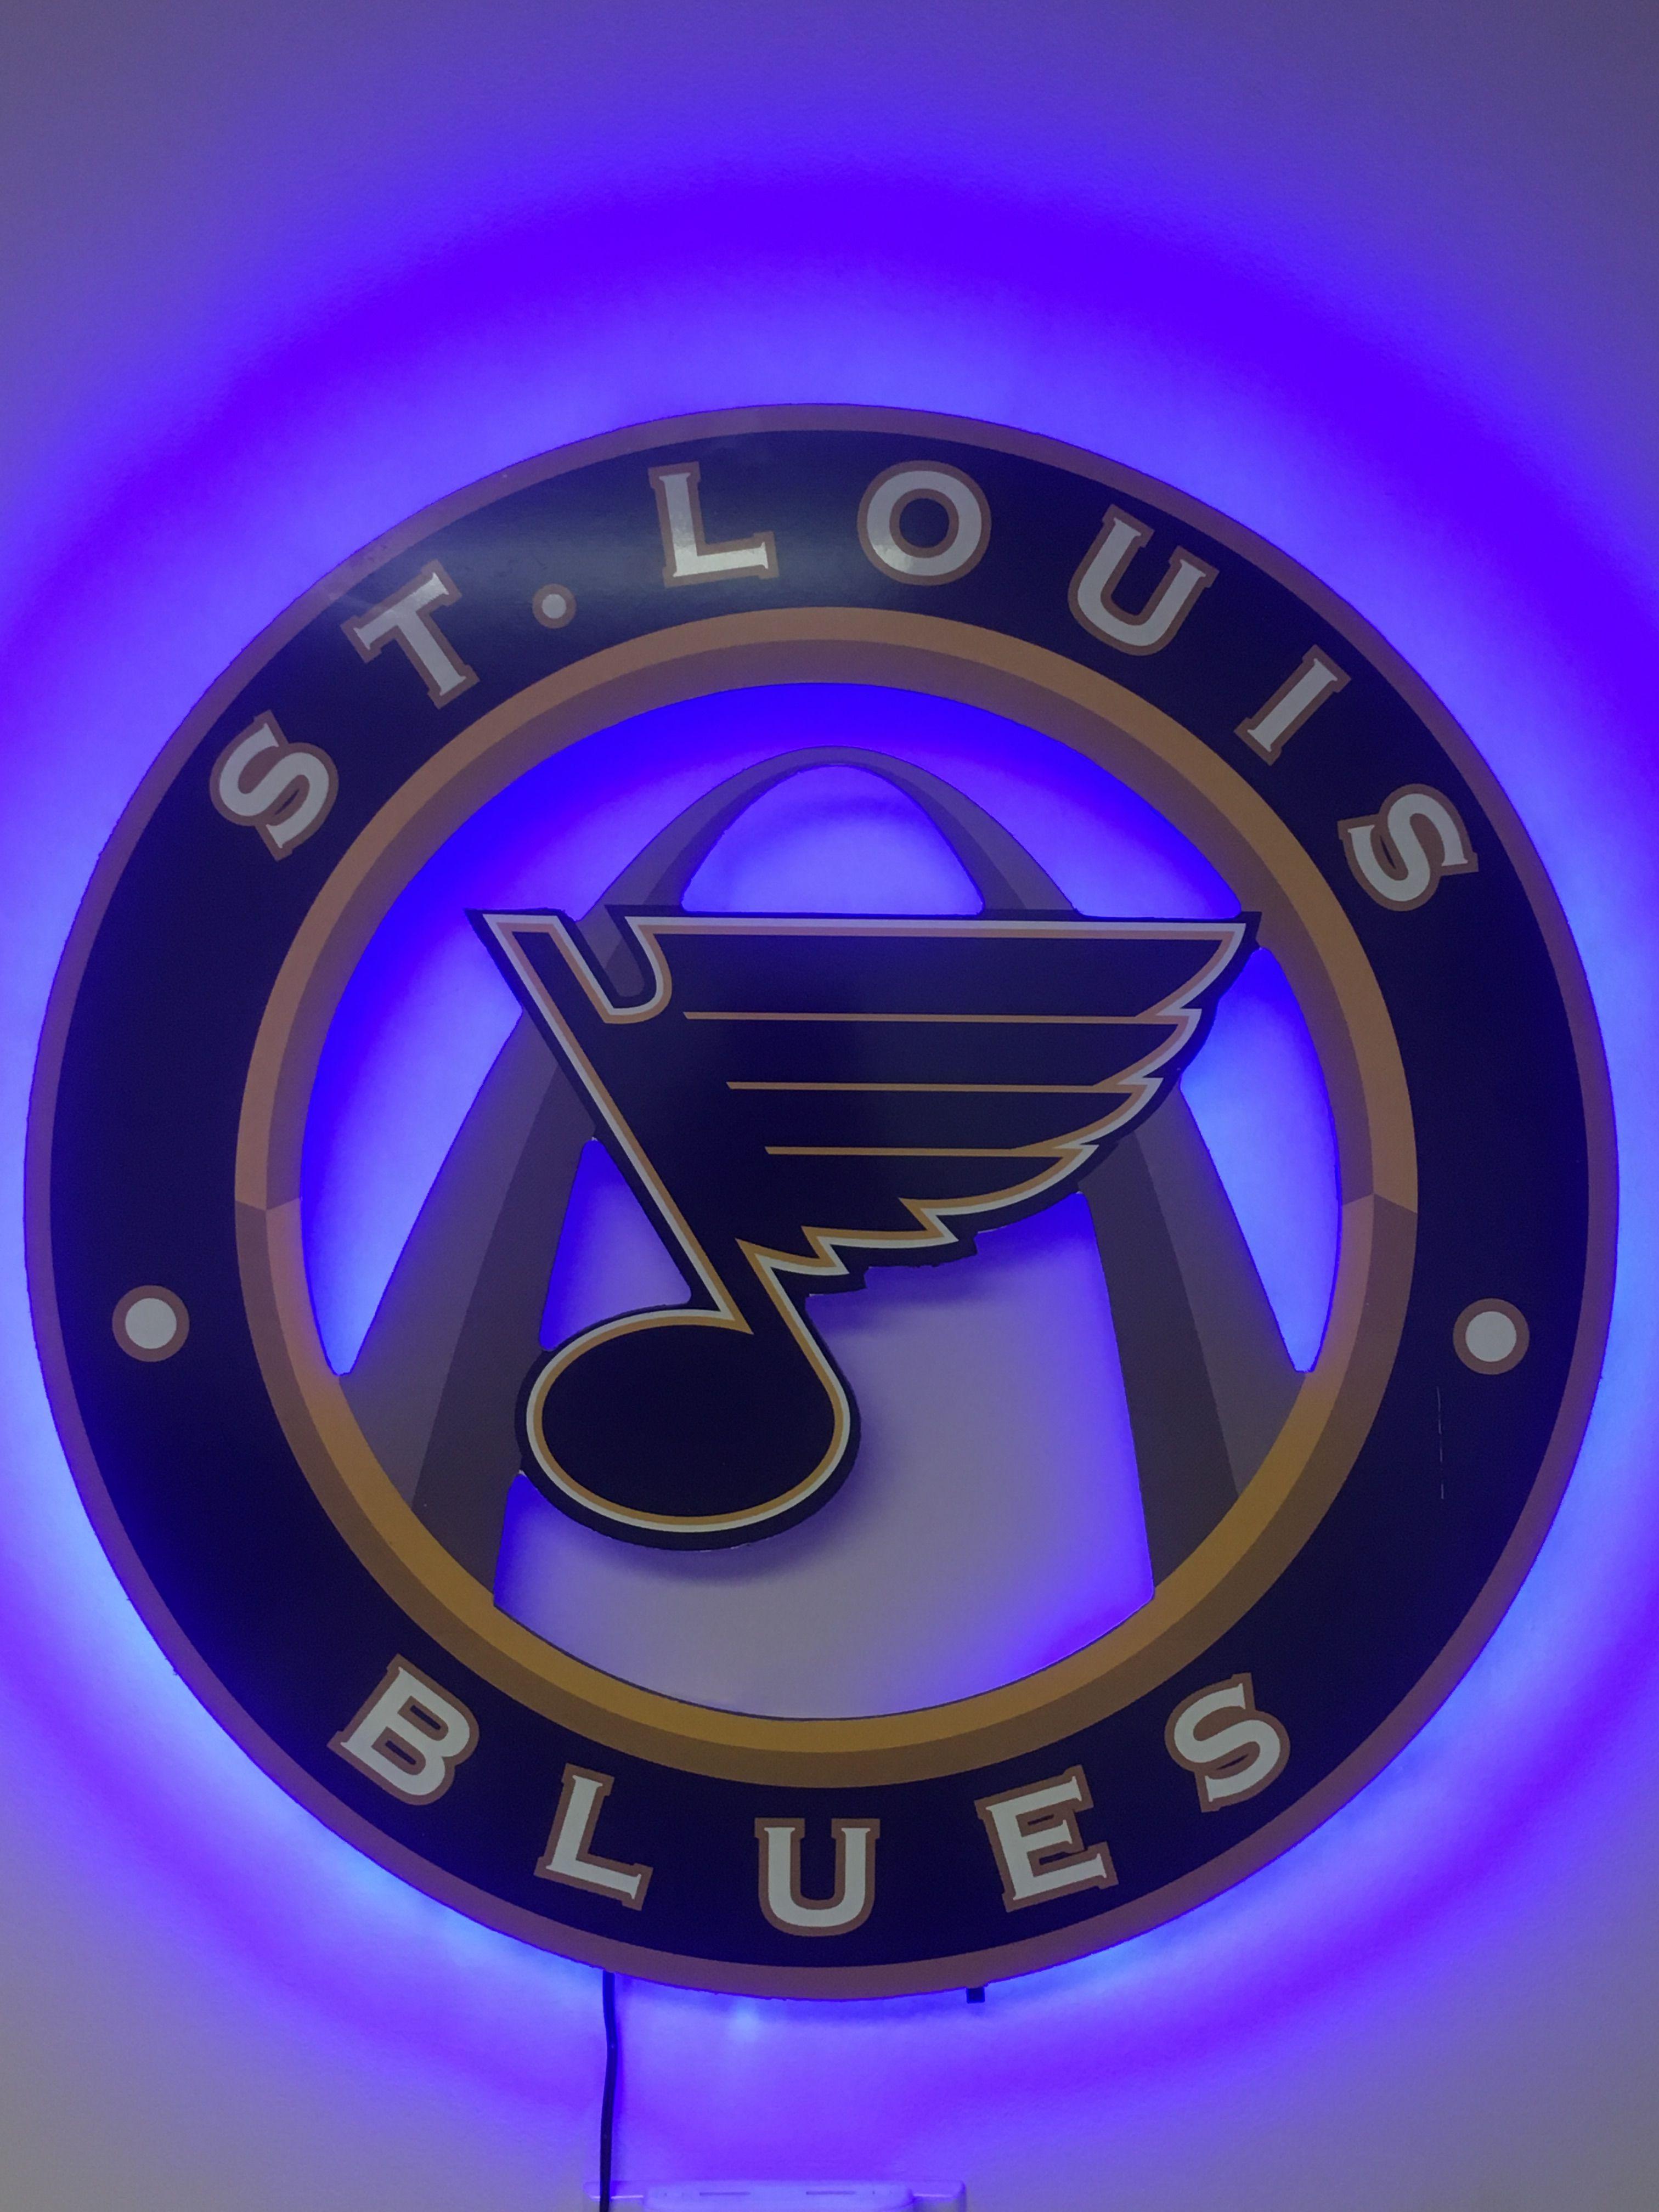 Pin by Emily Anne on St Louis Blues St louis blues, St